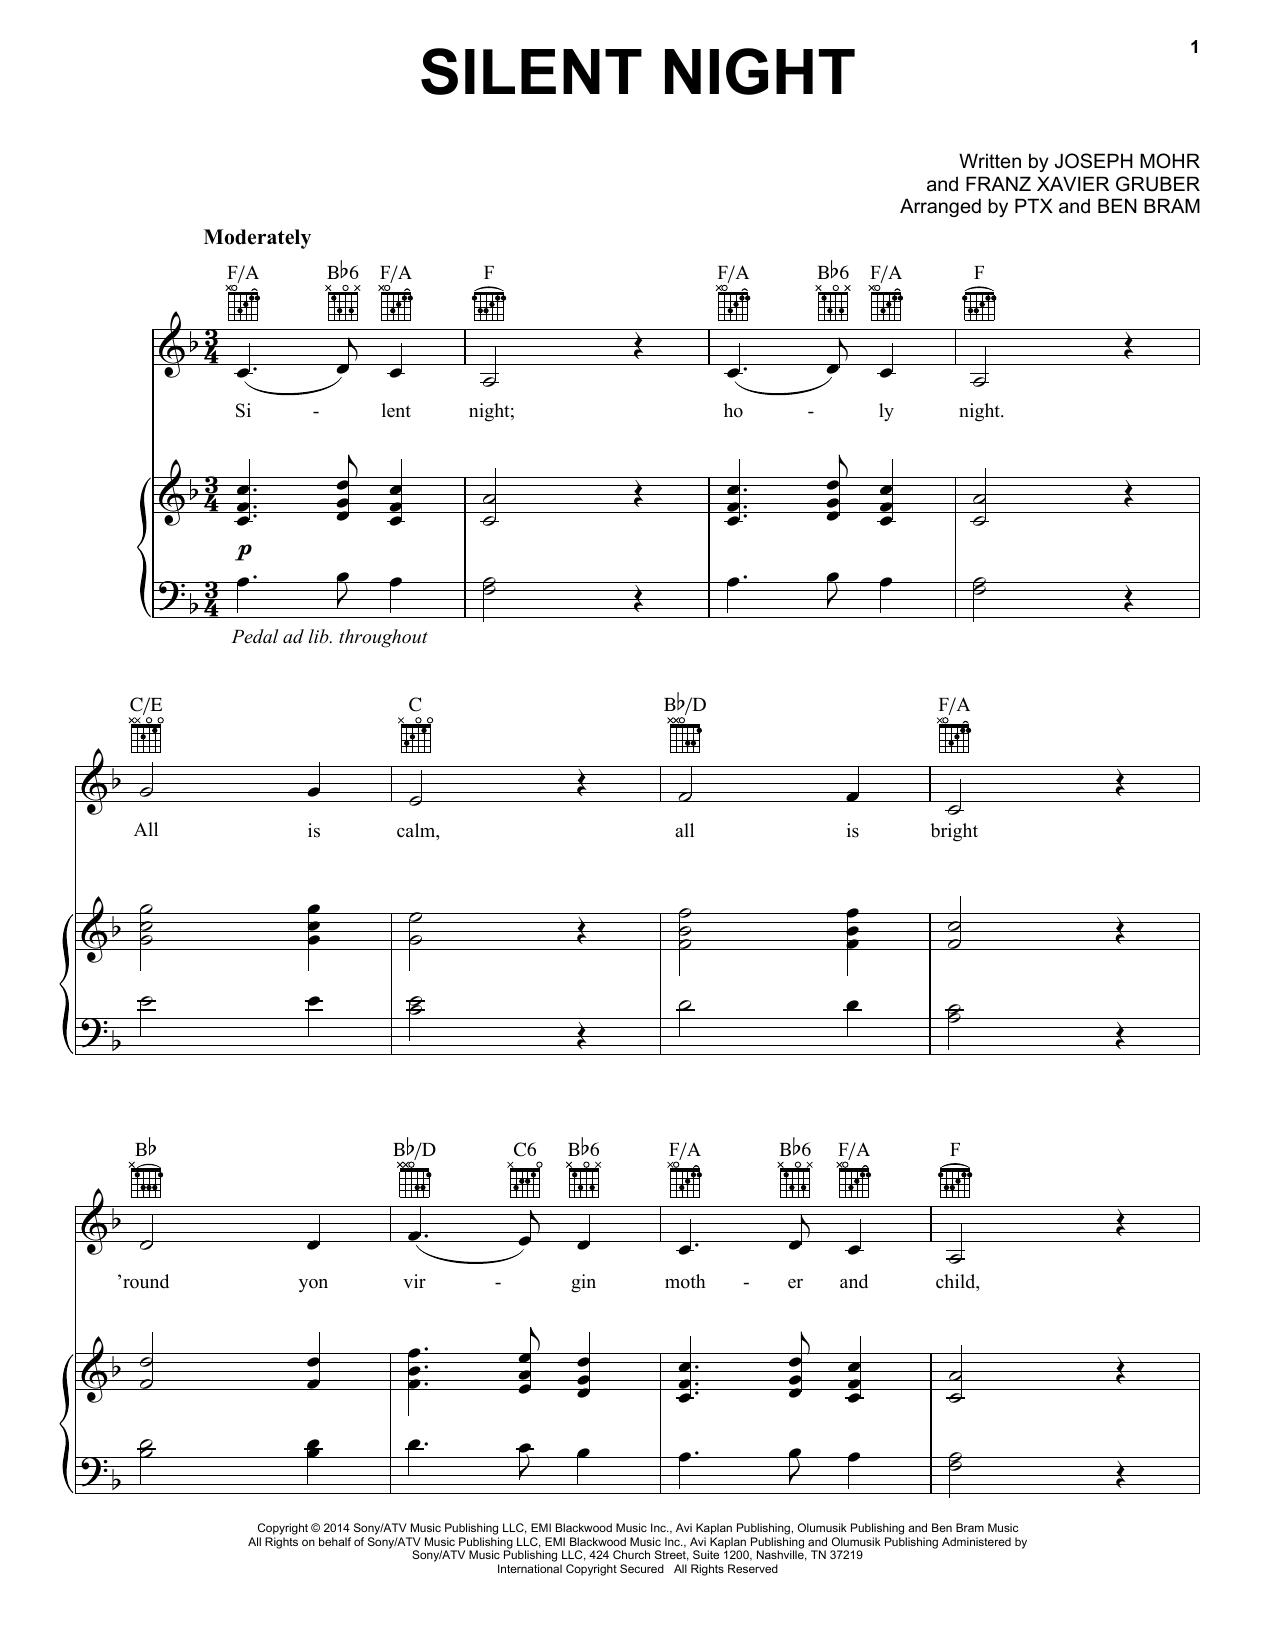 Pentatonix - Silent Night